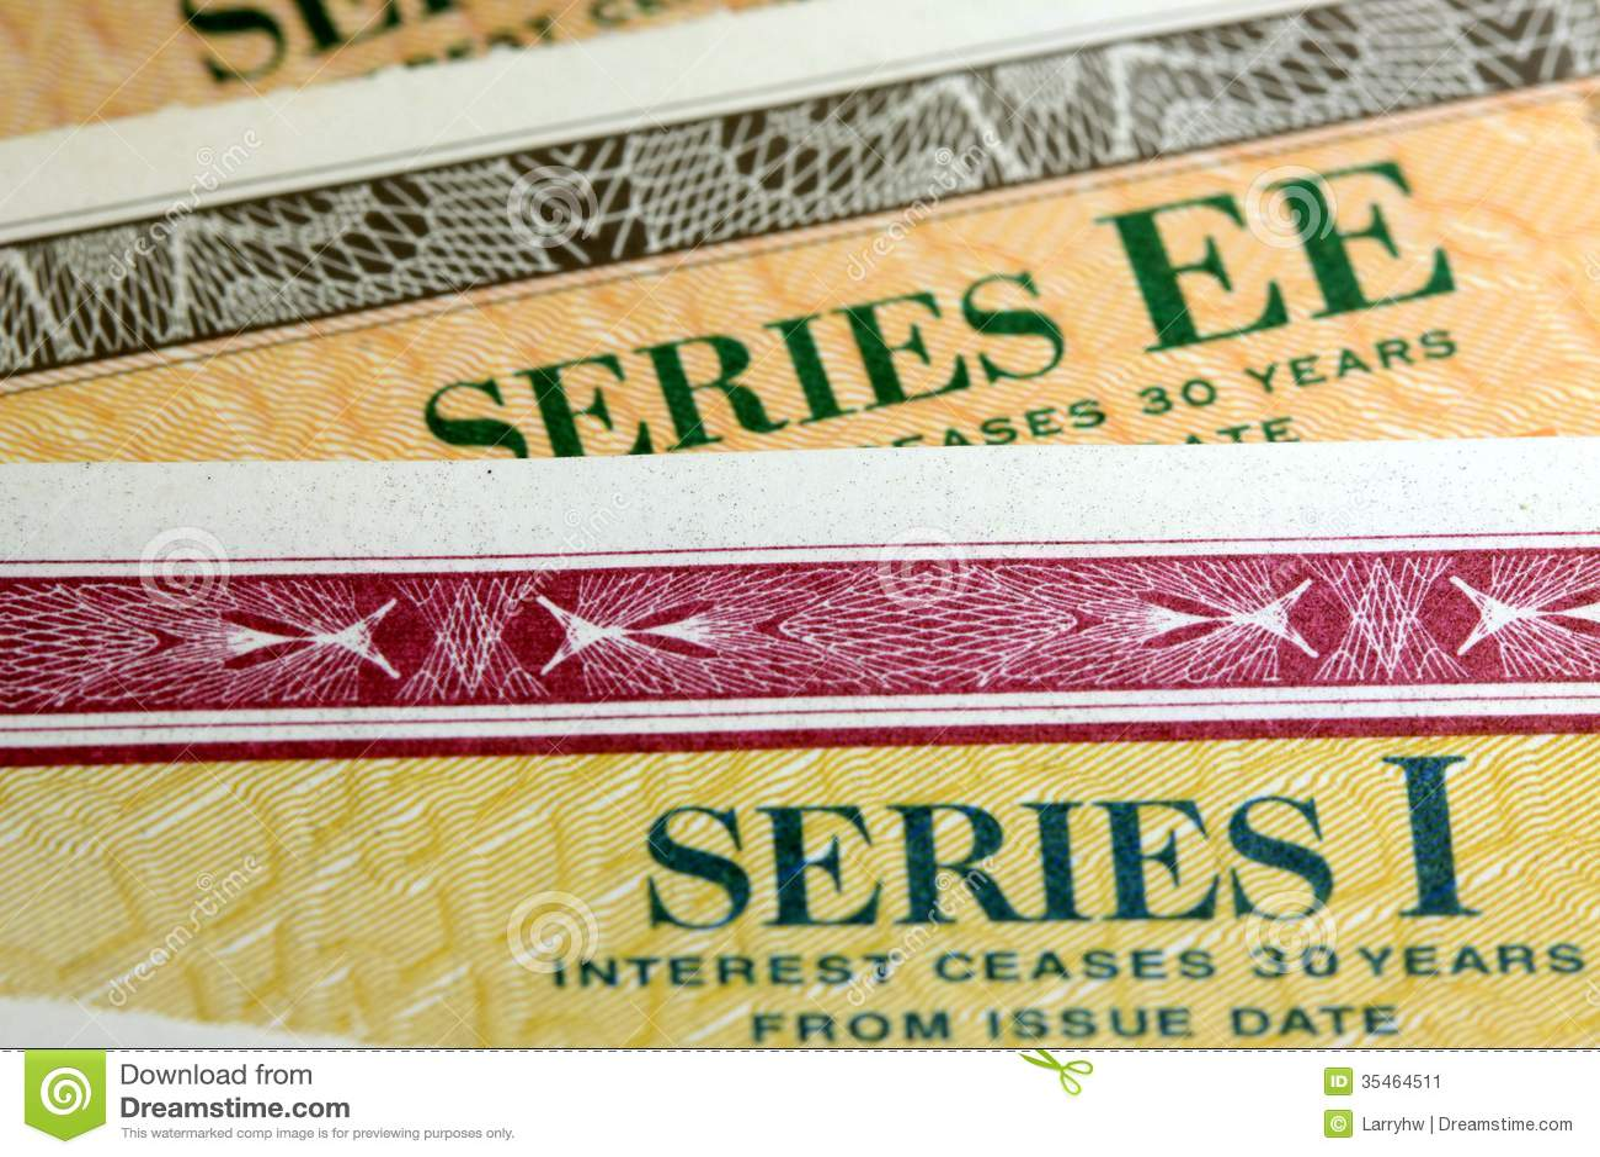 Stany Zjednoczone Savings więzi serie EE i serie - Ja